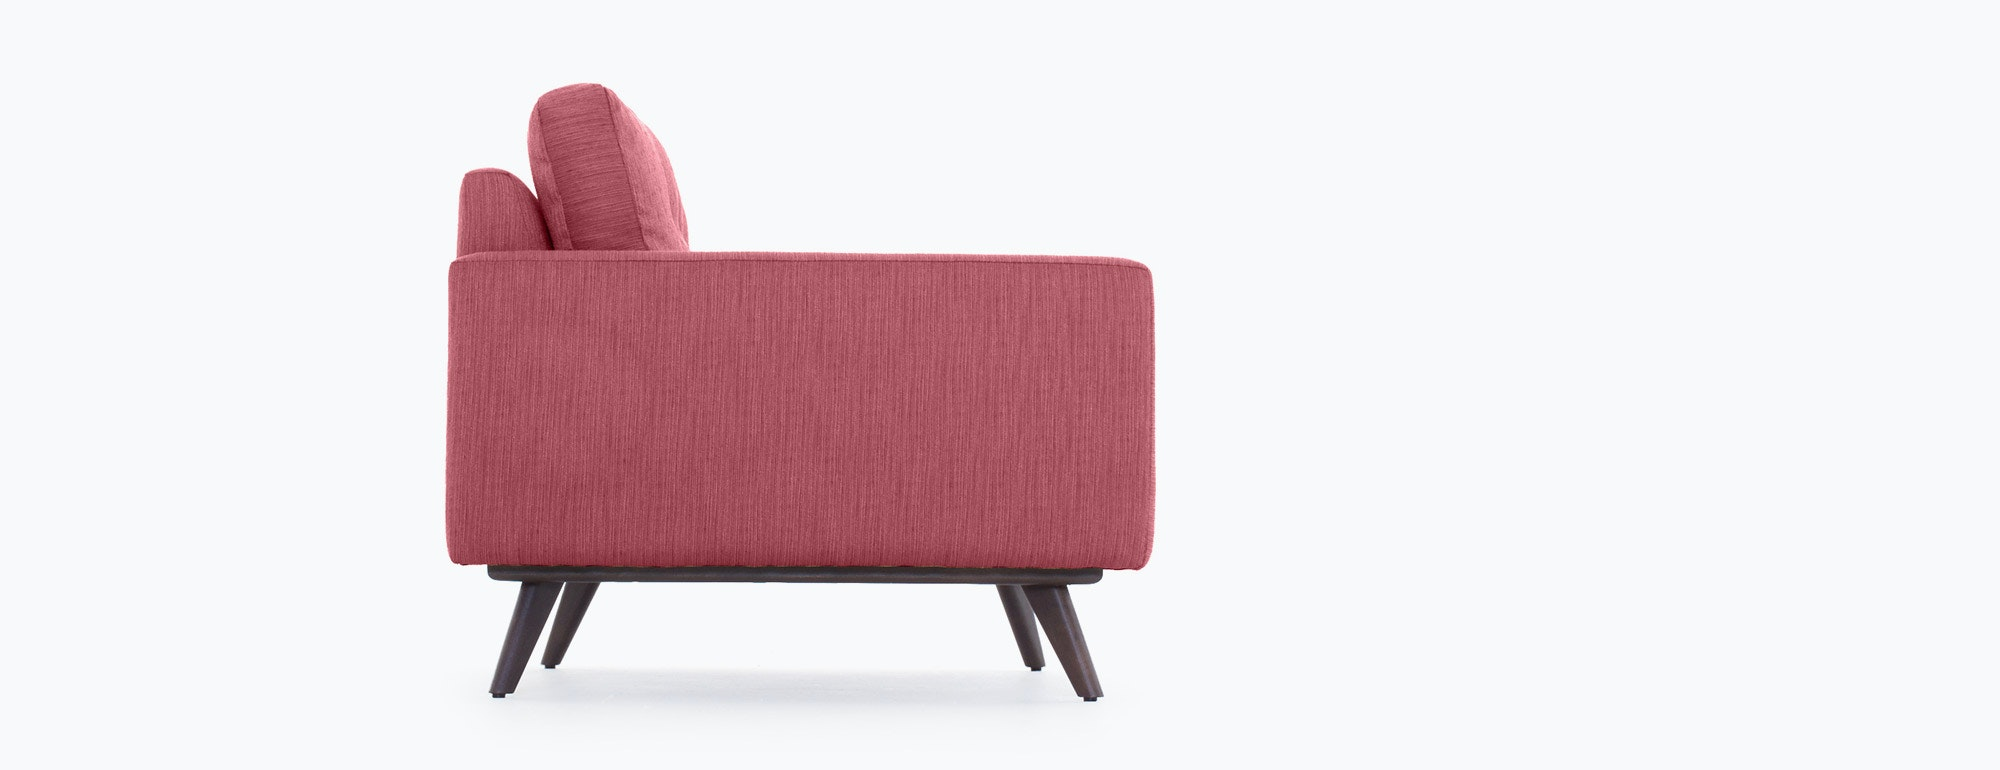 shown in Lingo Parfait Fabric